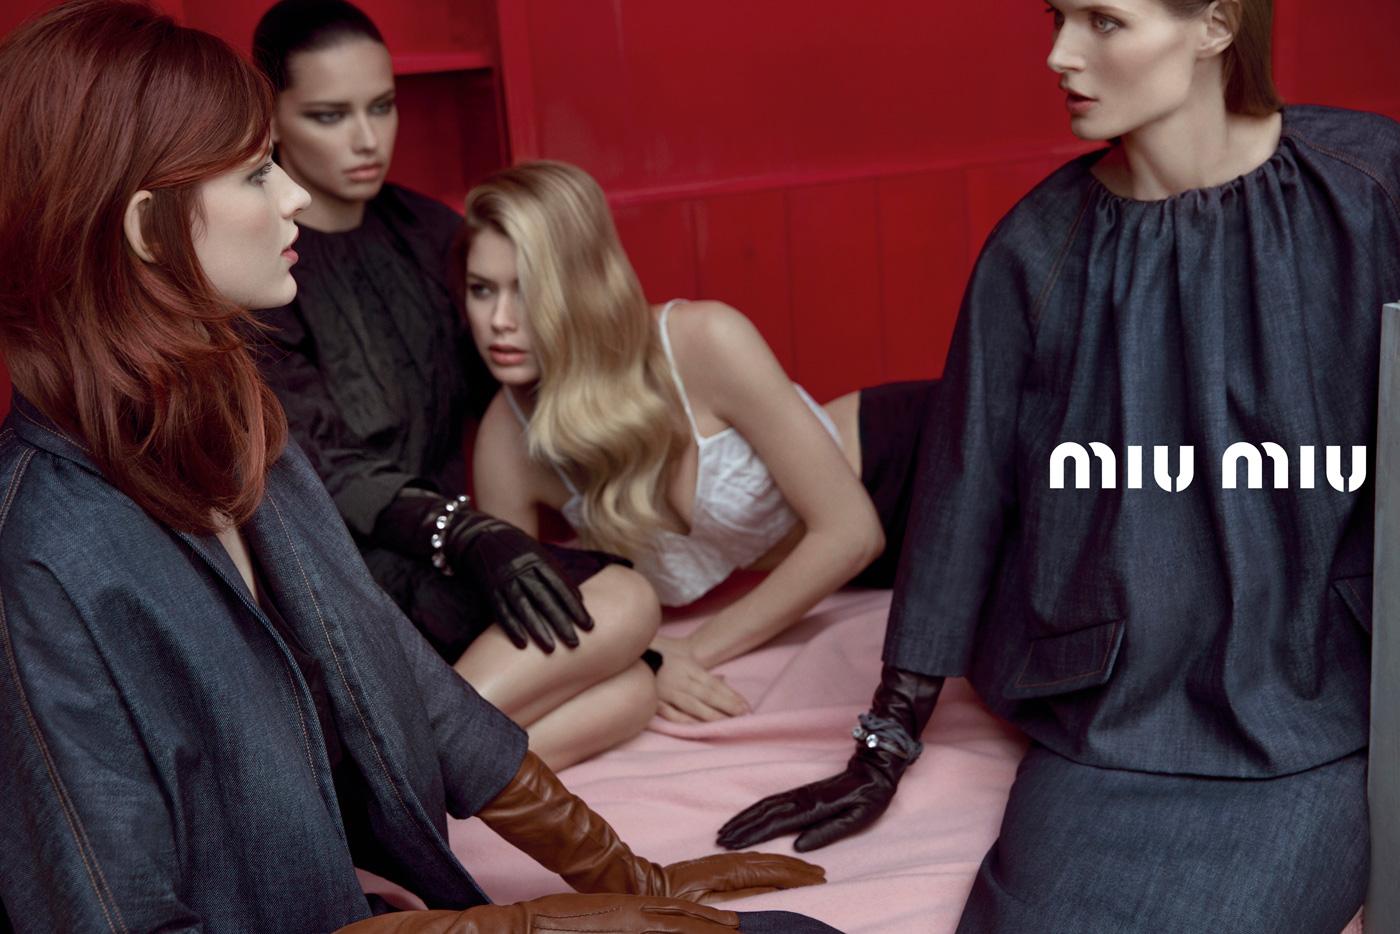 2736f30bb14a4 Miu Miu Spring 2013 Ad Campaign